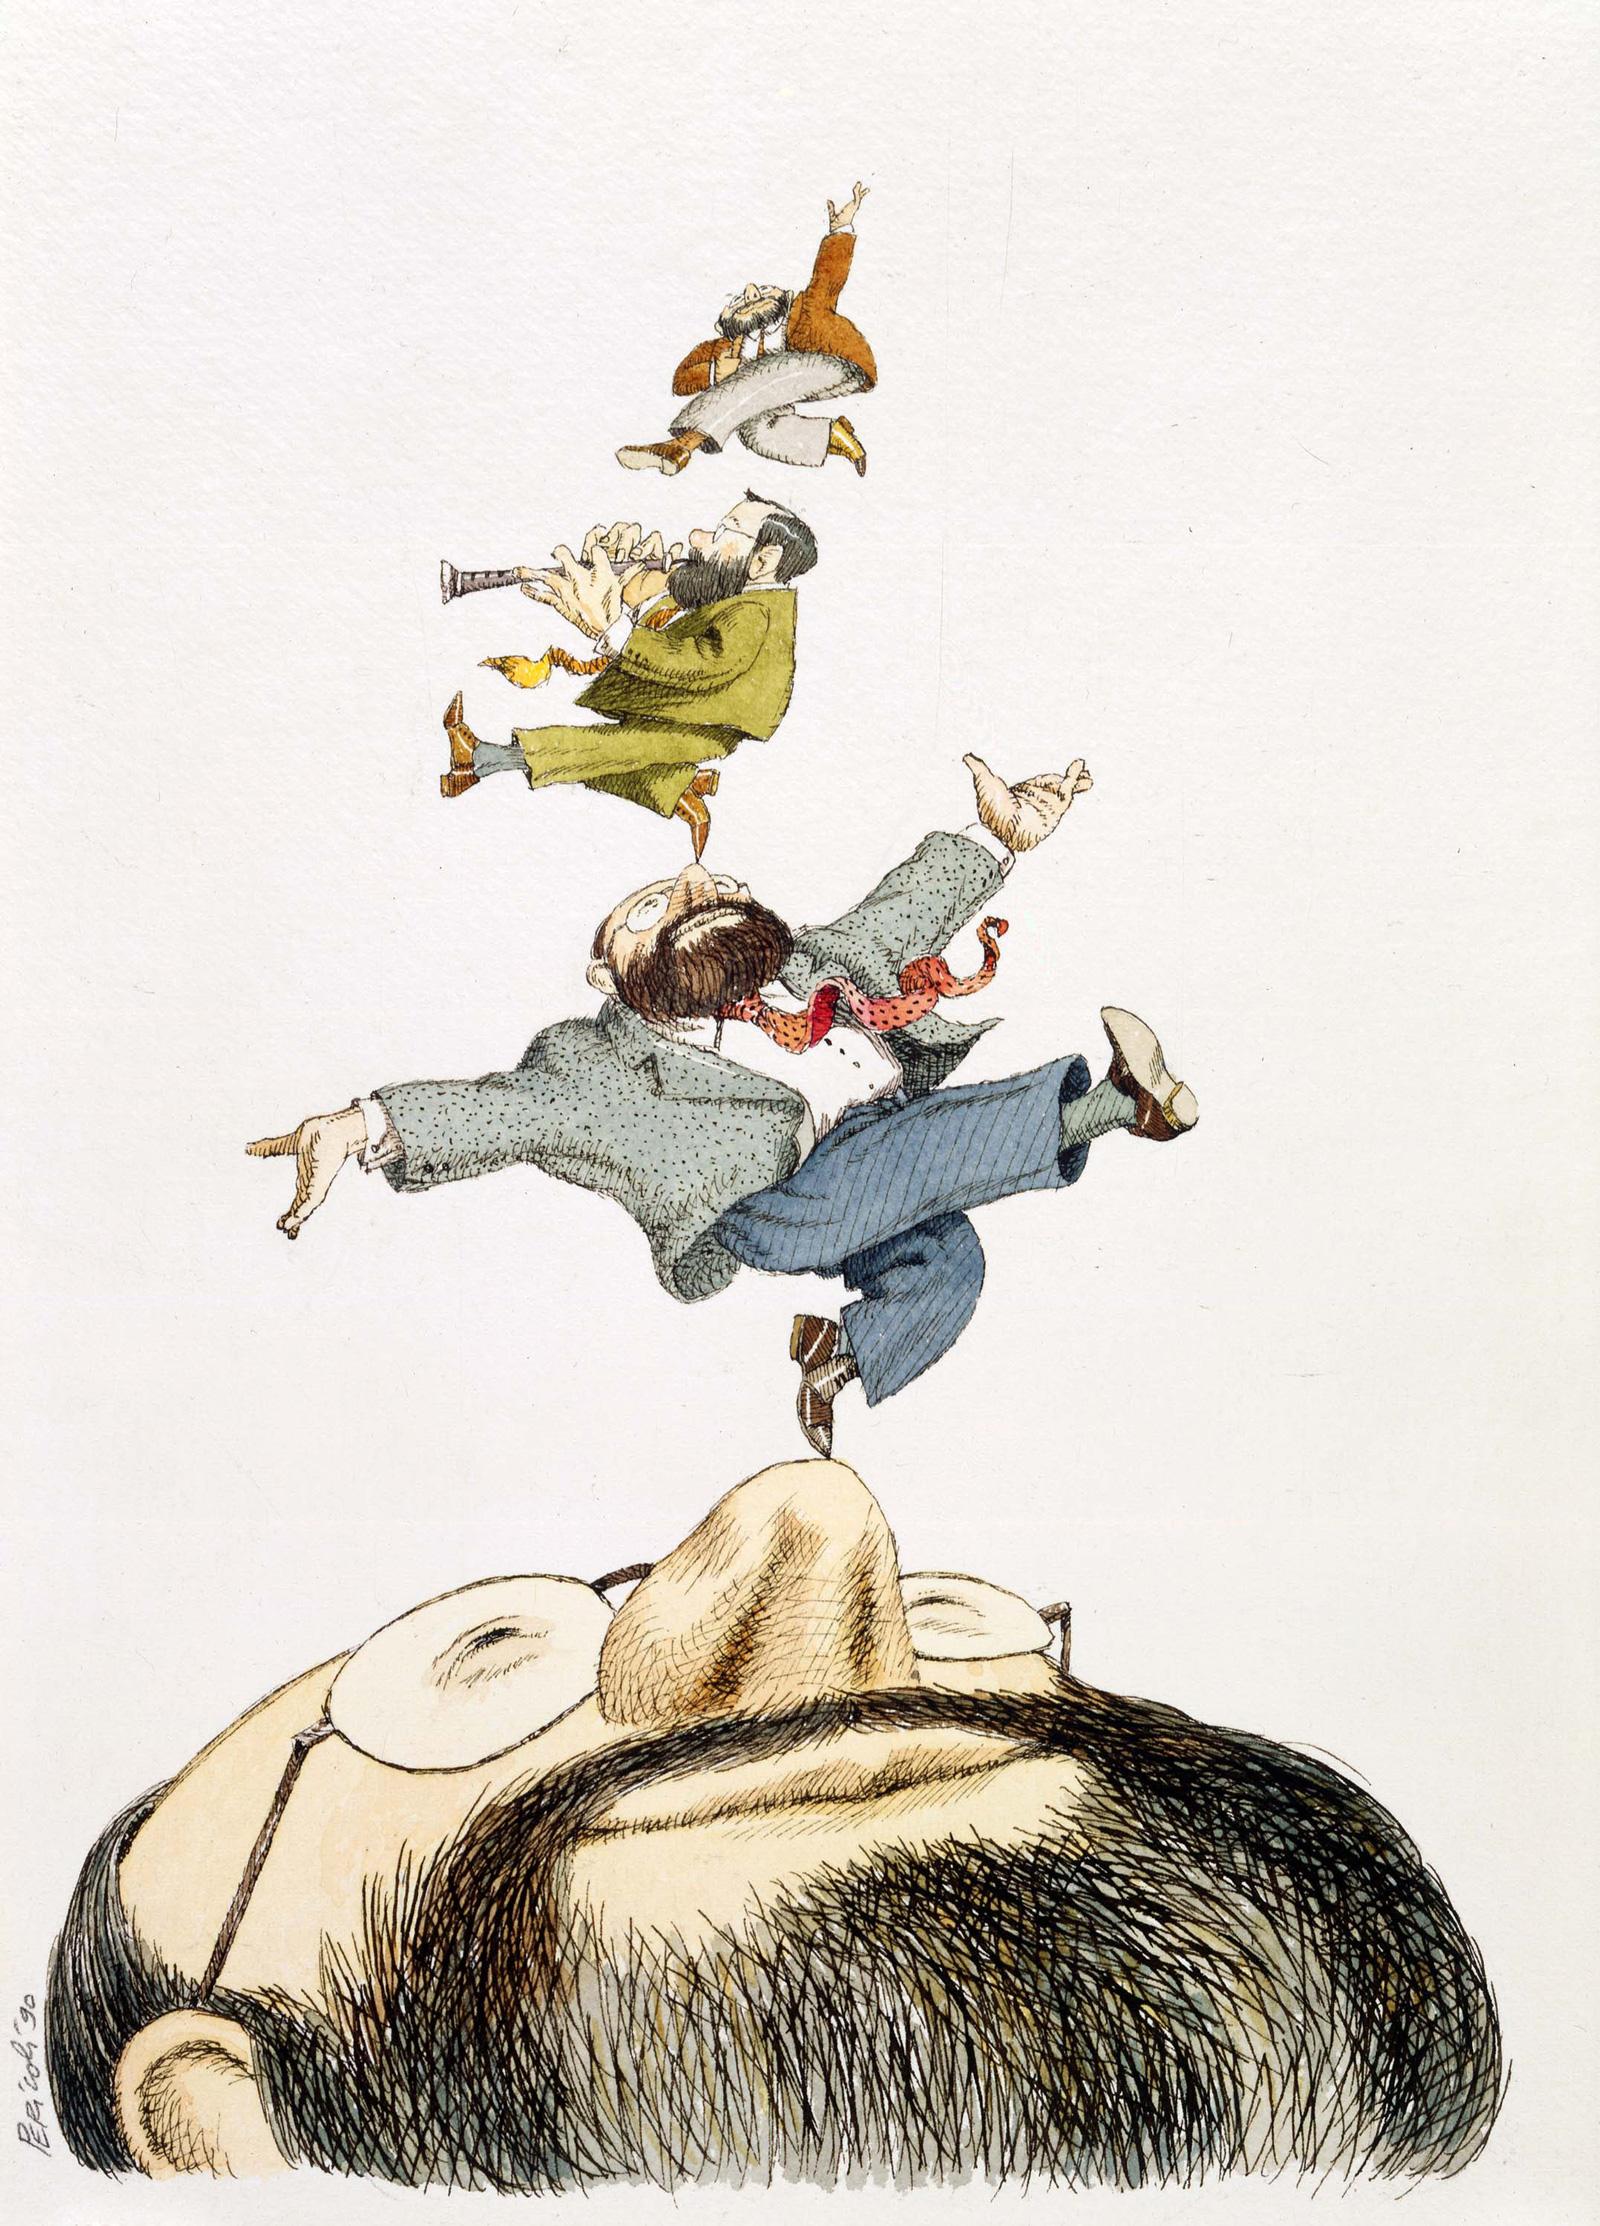 Portraits: Umberto Eco, Saul Steinberg, andAldoBuzzi | by Tullio Pericoli | NYR Daily | The New York Review of Books